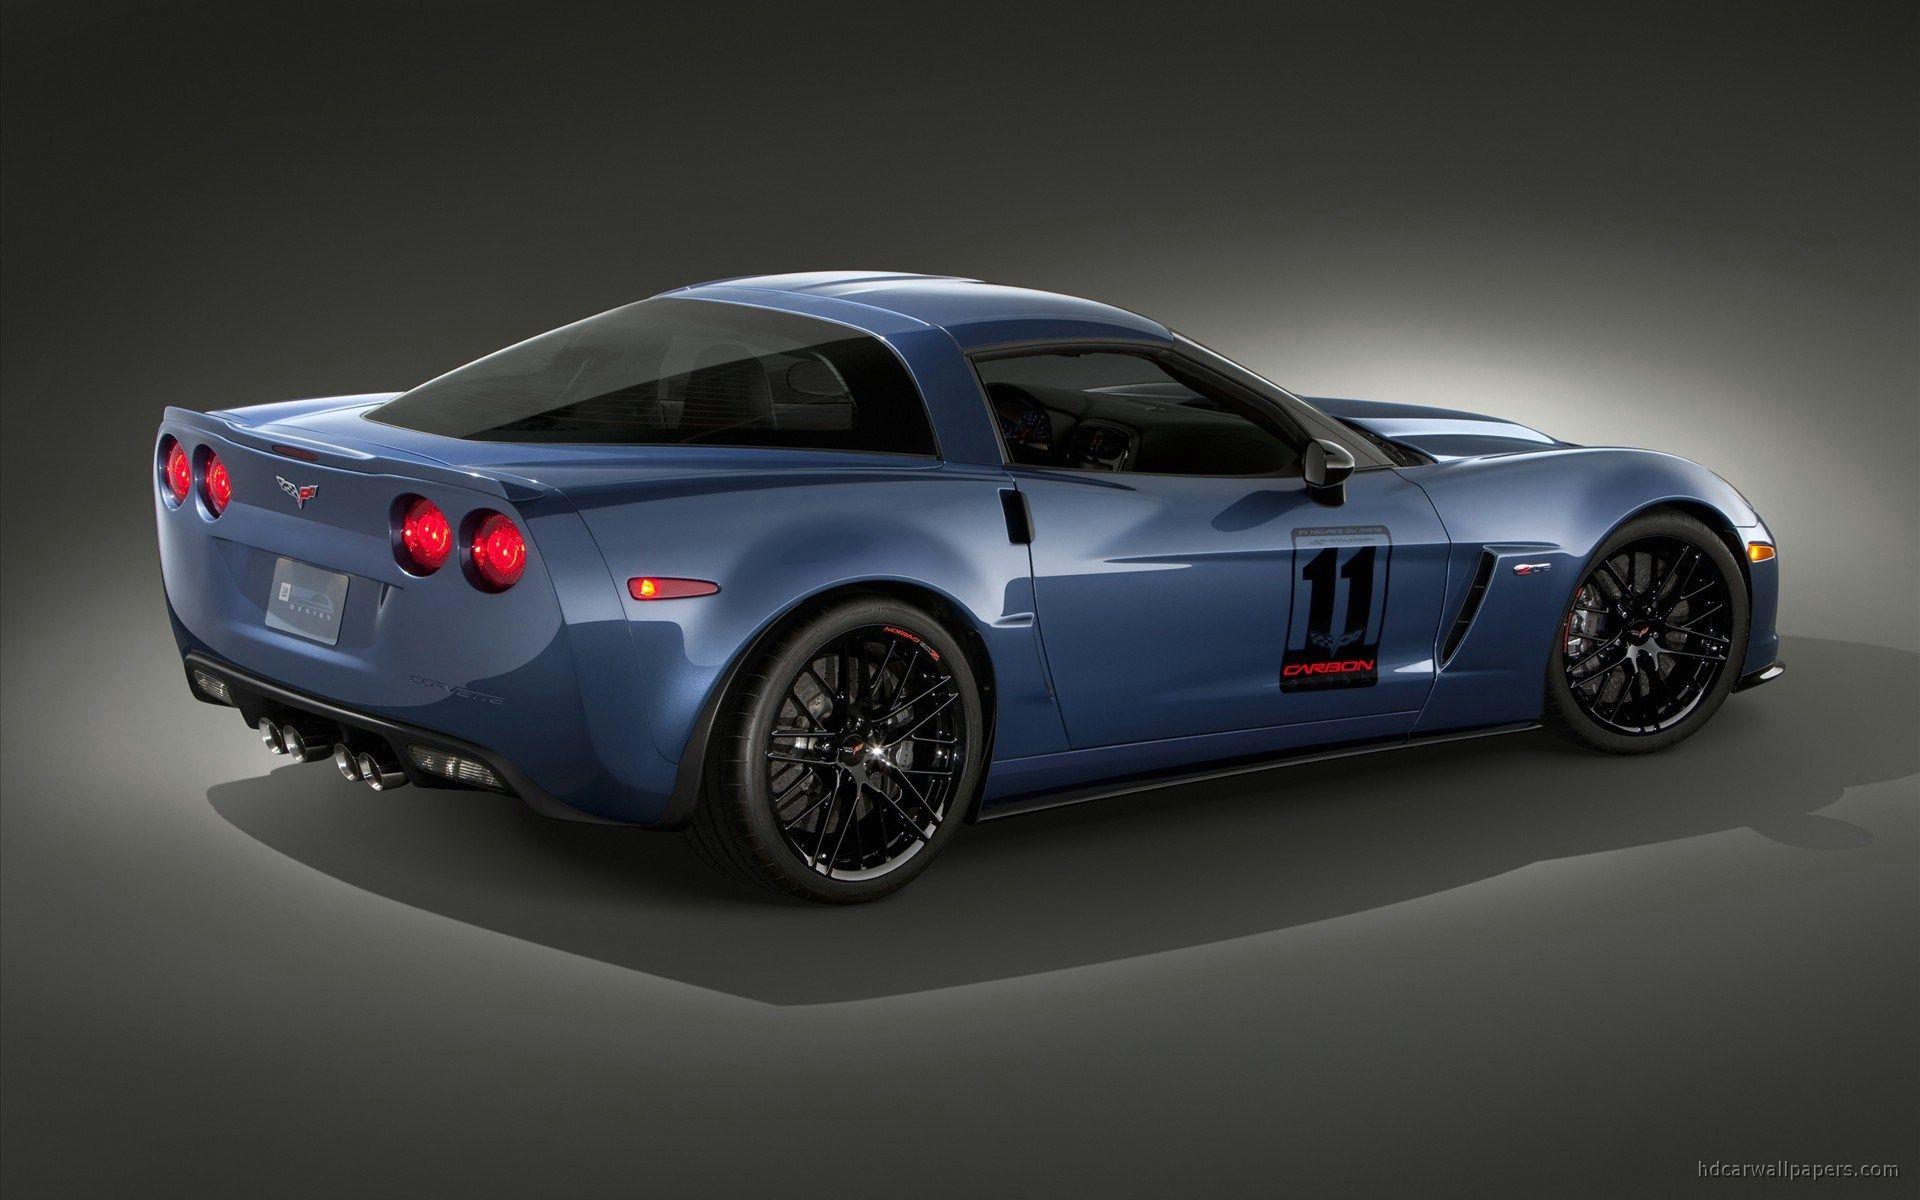 Merveilleux Chevrolet Corvette